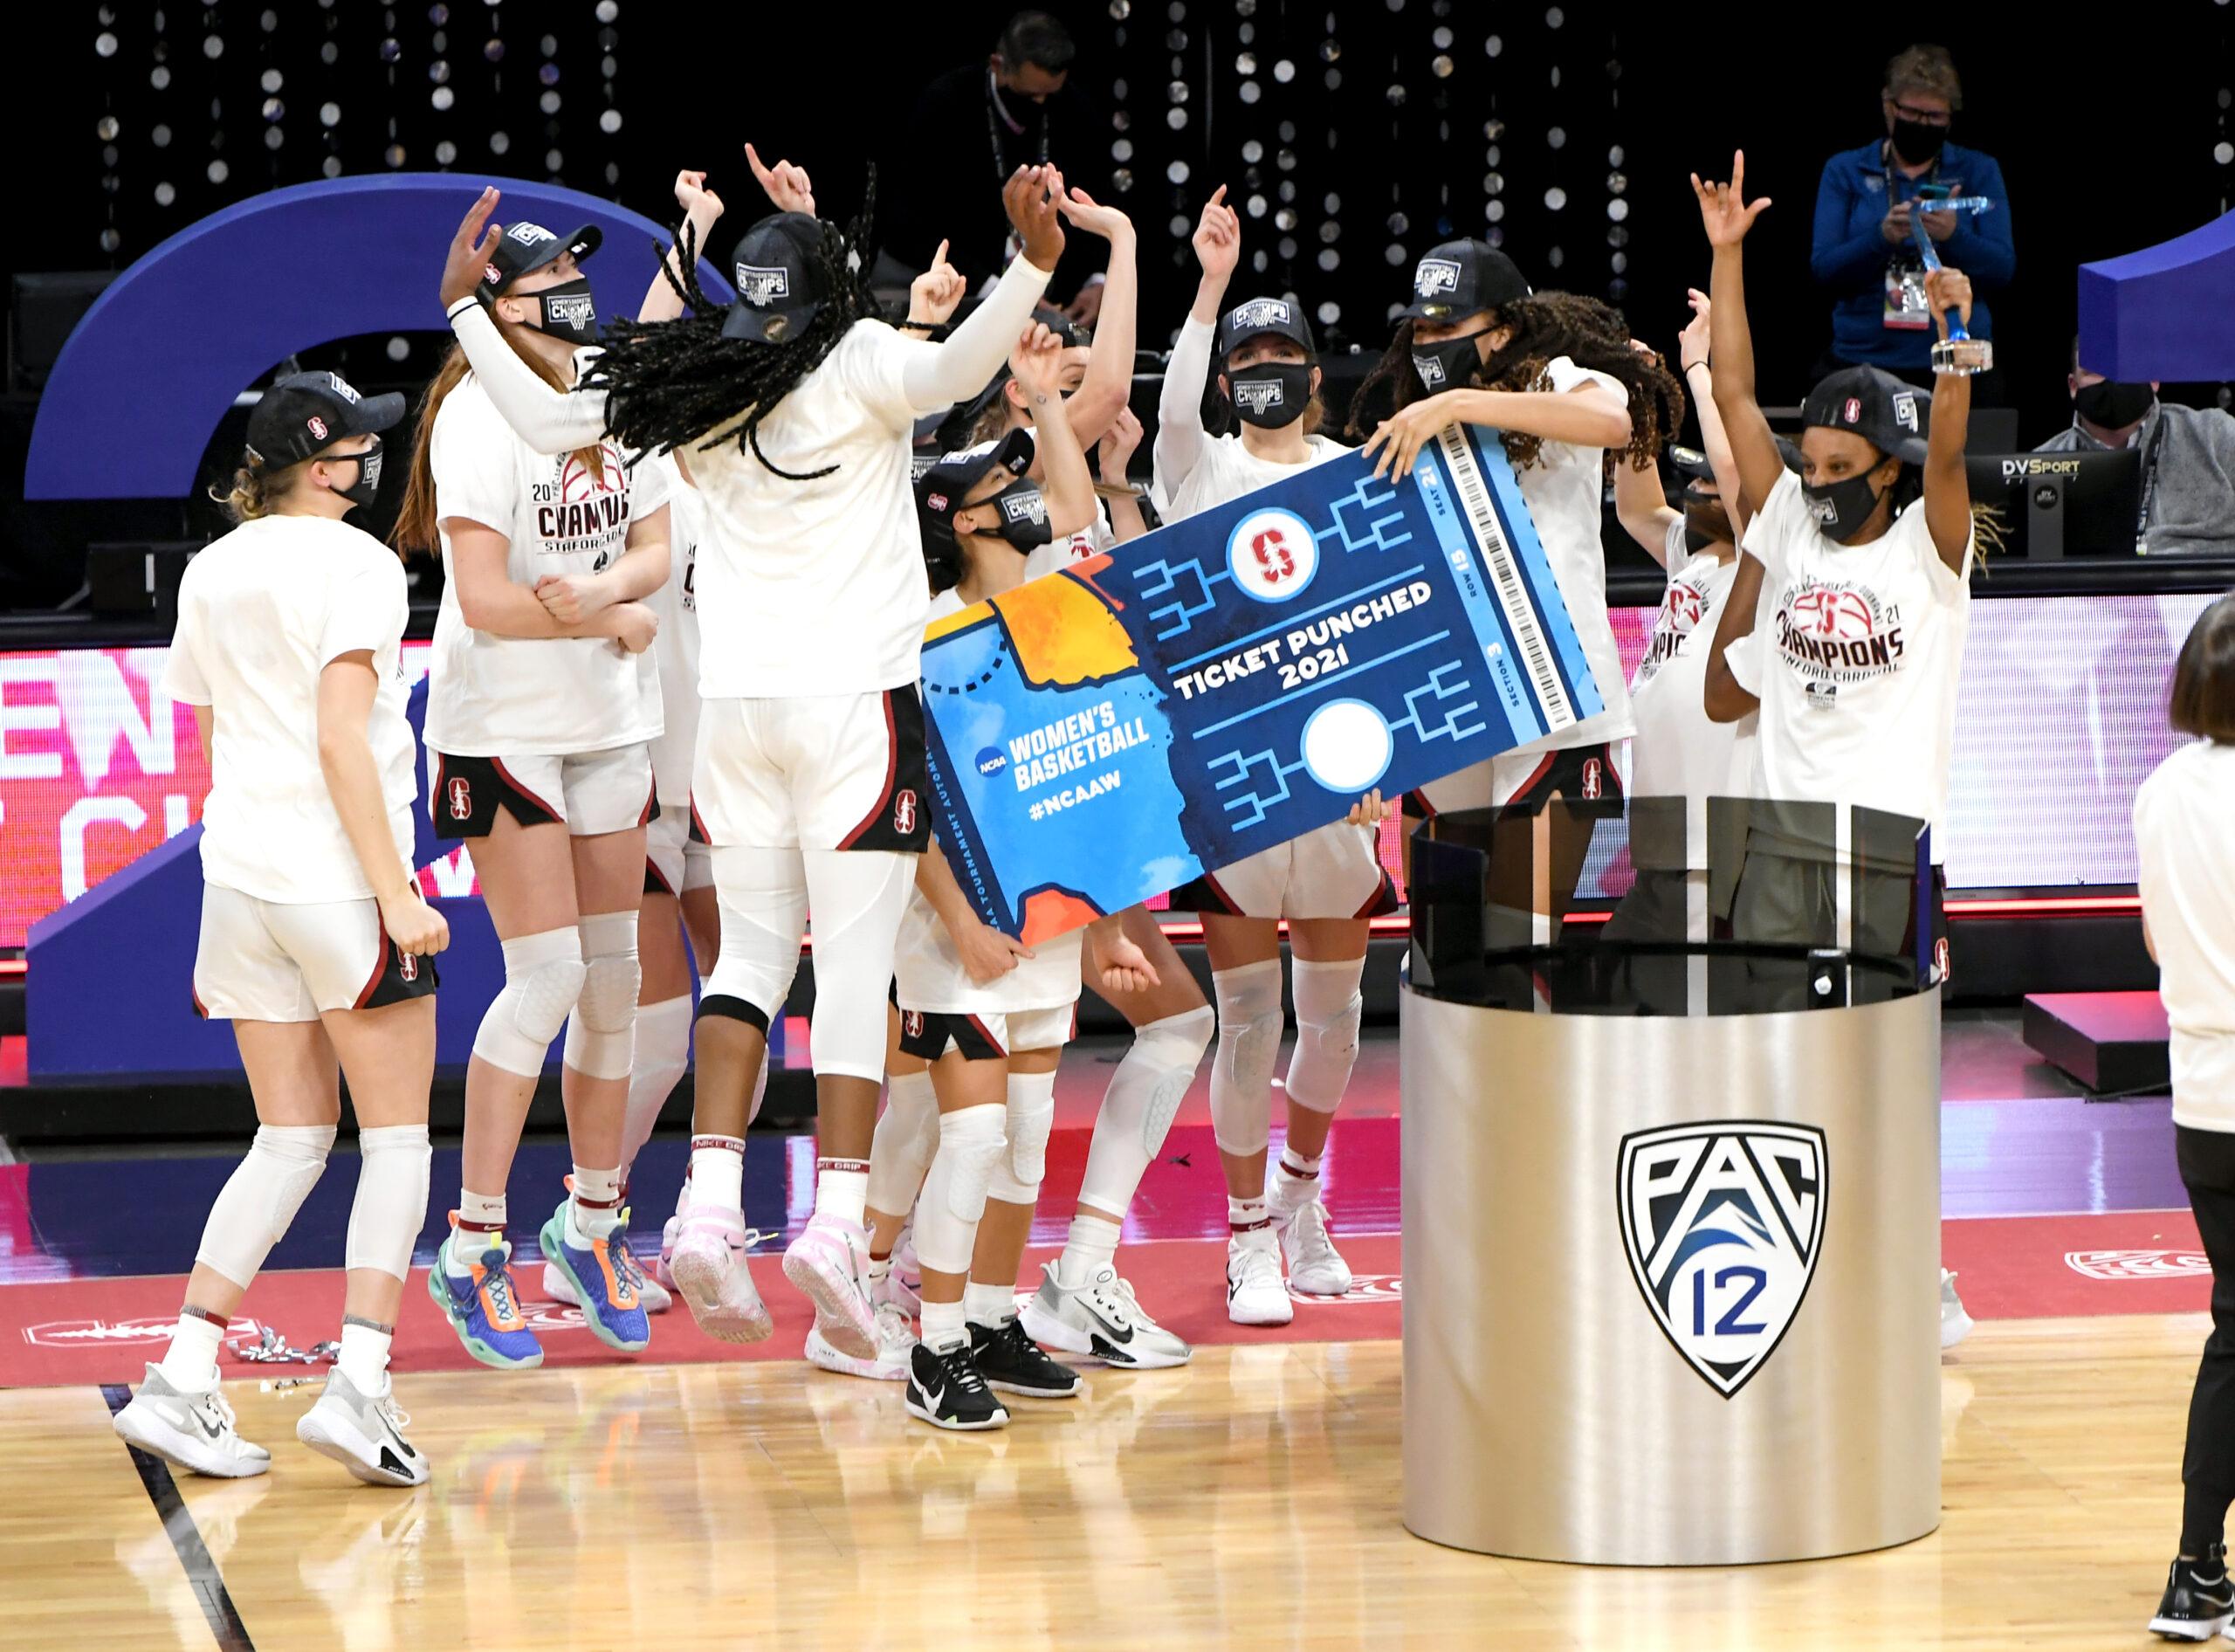 2021 NCAA DI women's basketball conference tournament champions